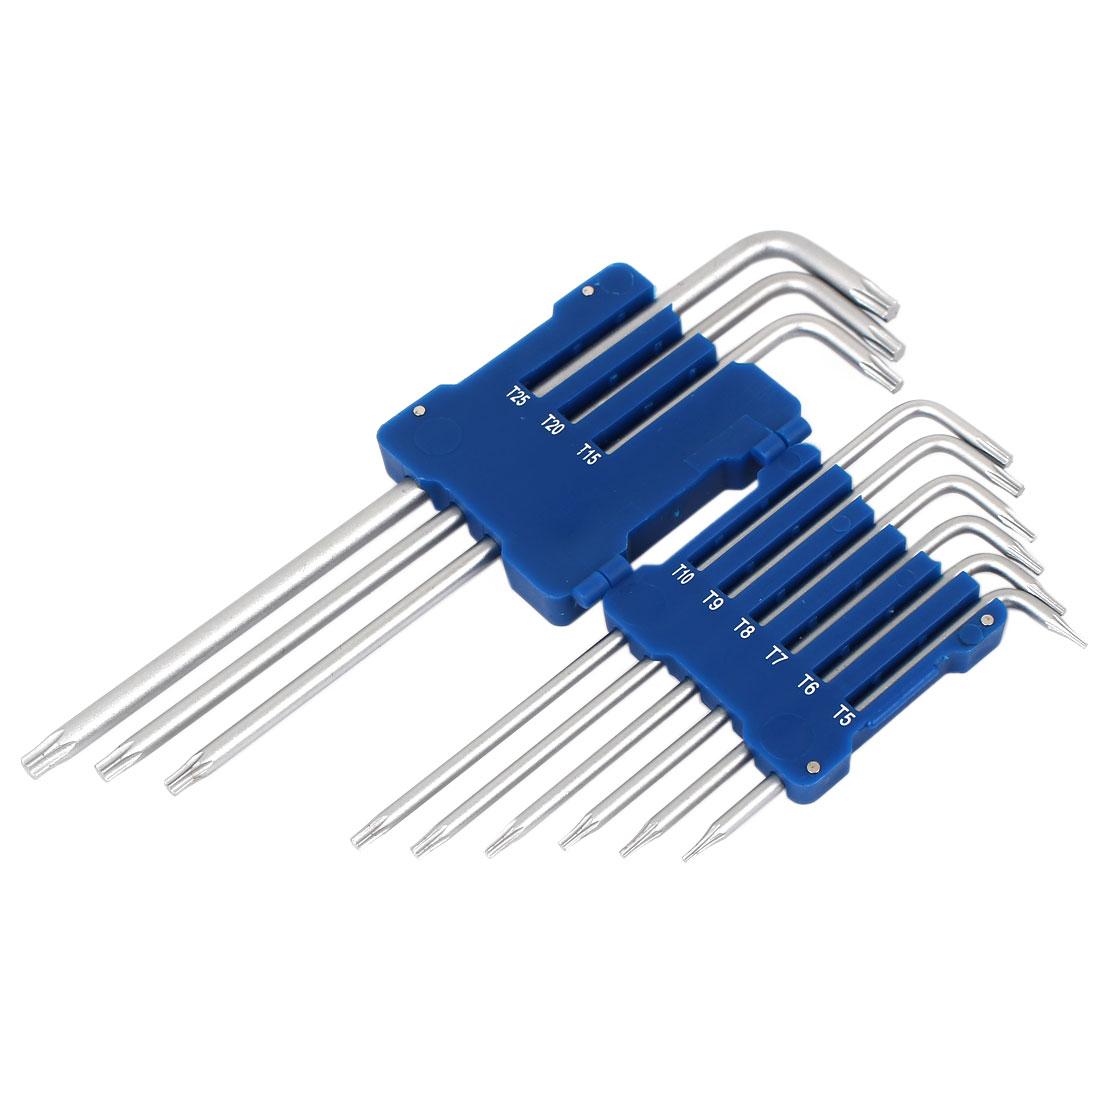 Star Torx Key Wrench Spanner Screwdriver Set Repairing Tool Kits 9 in 1